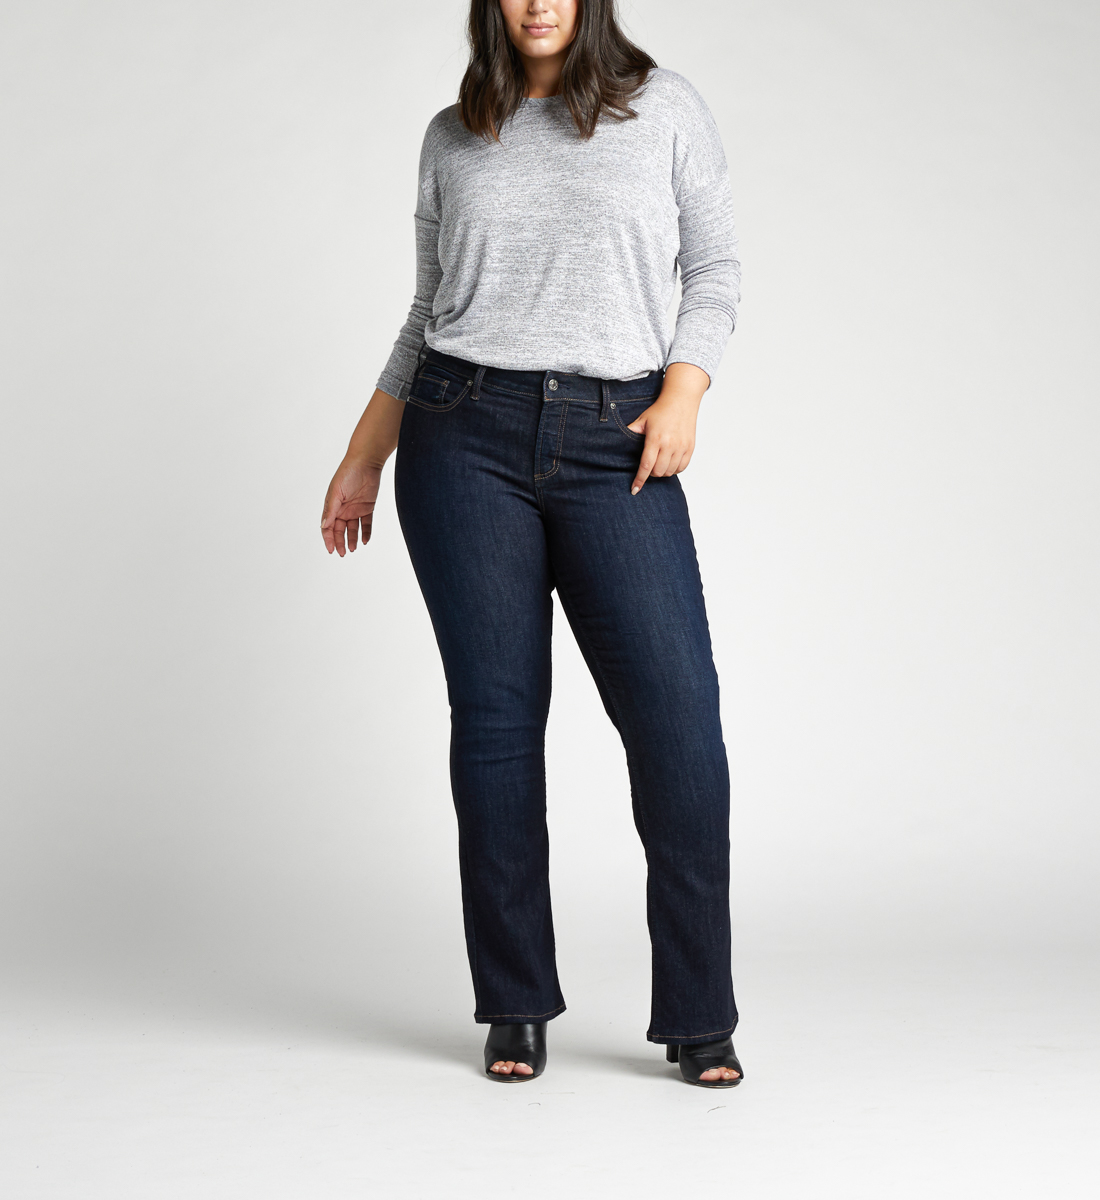 Silver Jeans Elyse Mid Rise Slim Bootcut Plus Size Jeans